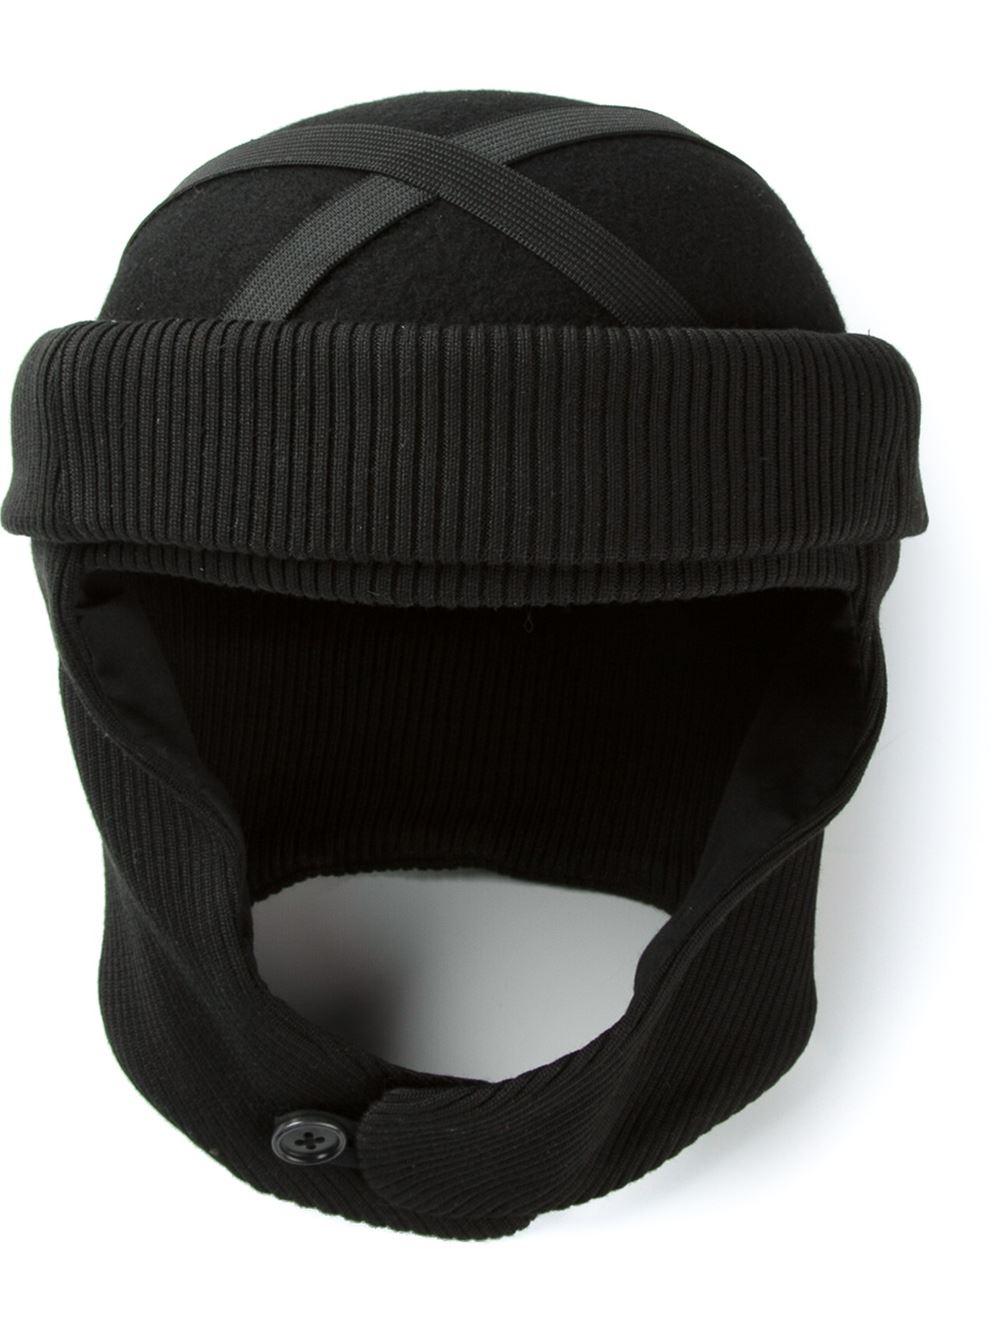 Lyst - Henrik Vibskov Elias Hat in Black for Men 88c7bf7ece2